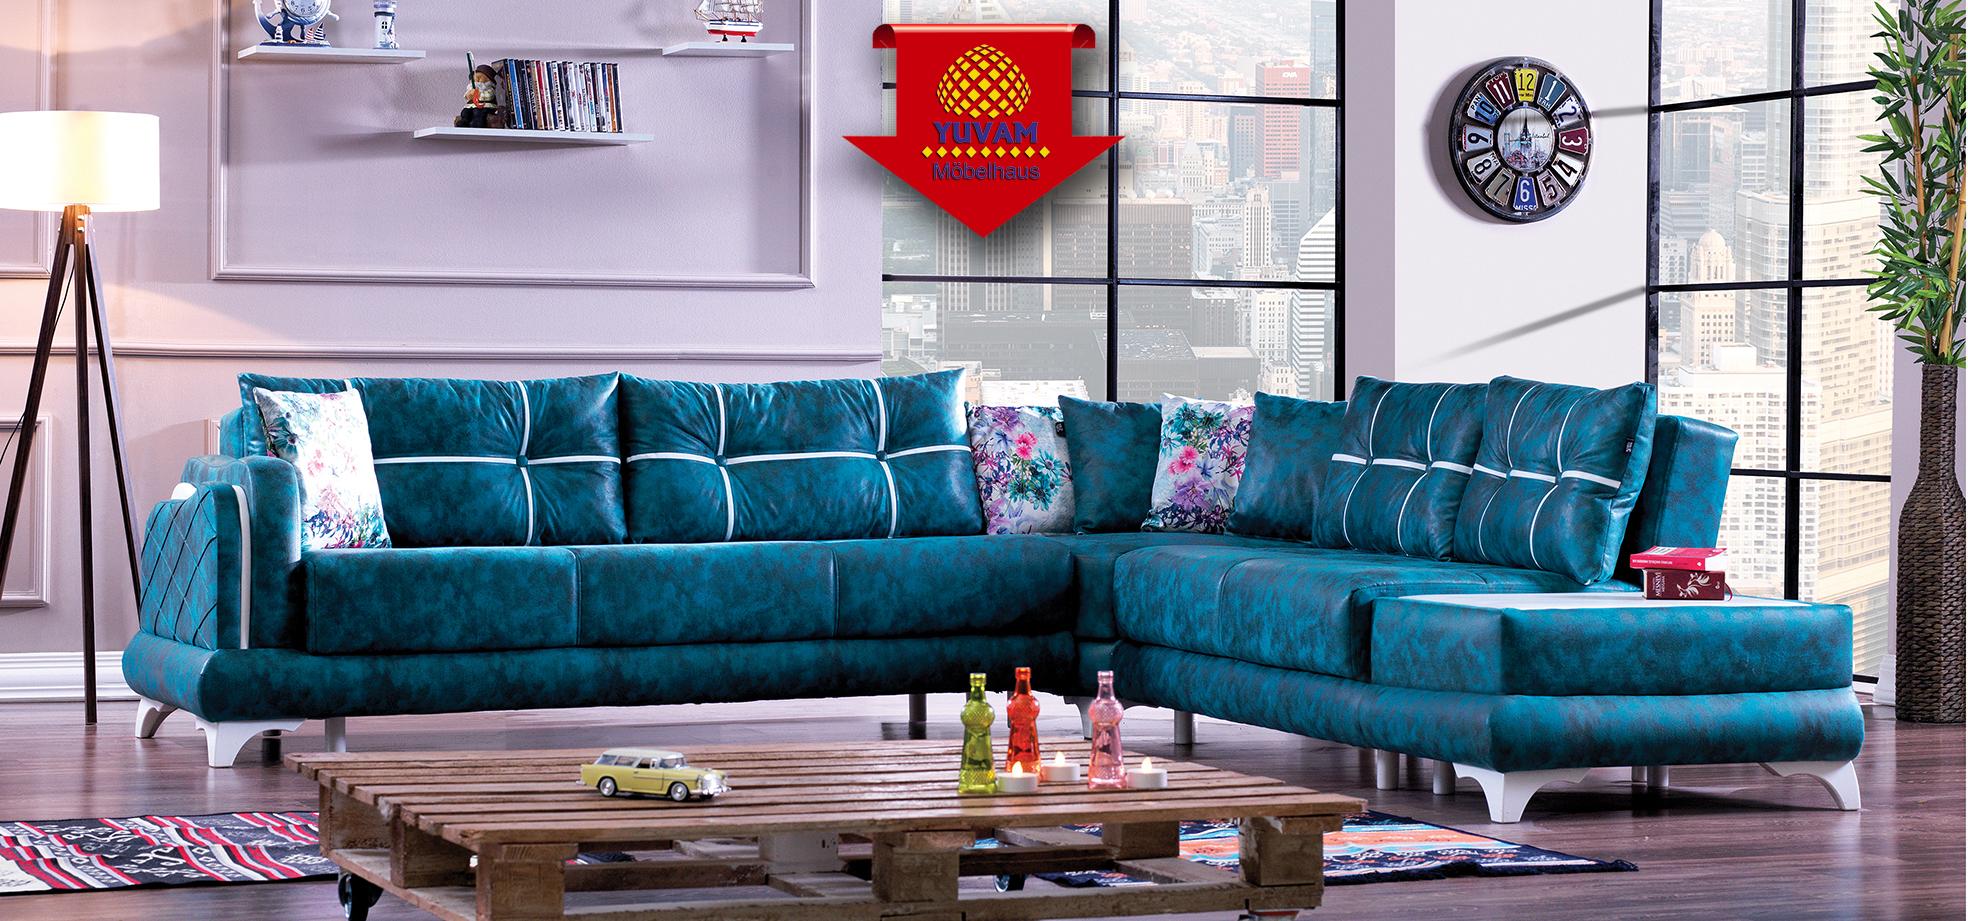 madrid sitzecke 3 v 2 yuvam m belhaus in wuppertal cilek offizieller h ndler in europa. Black Bedroom Furniture Sets. Home Design Ideas